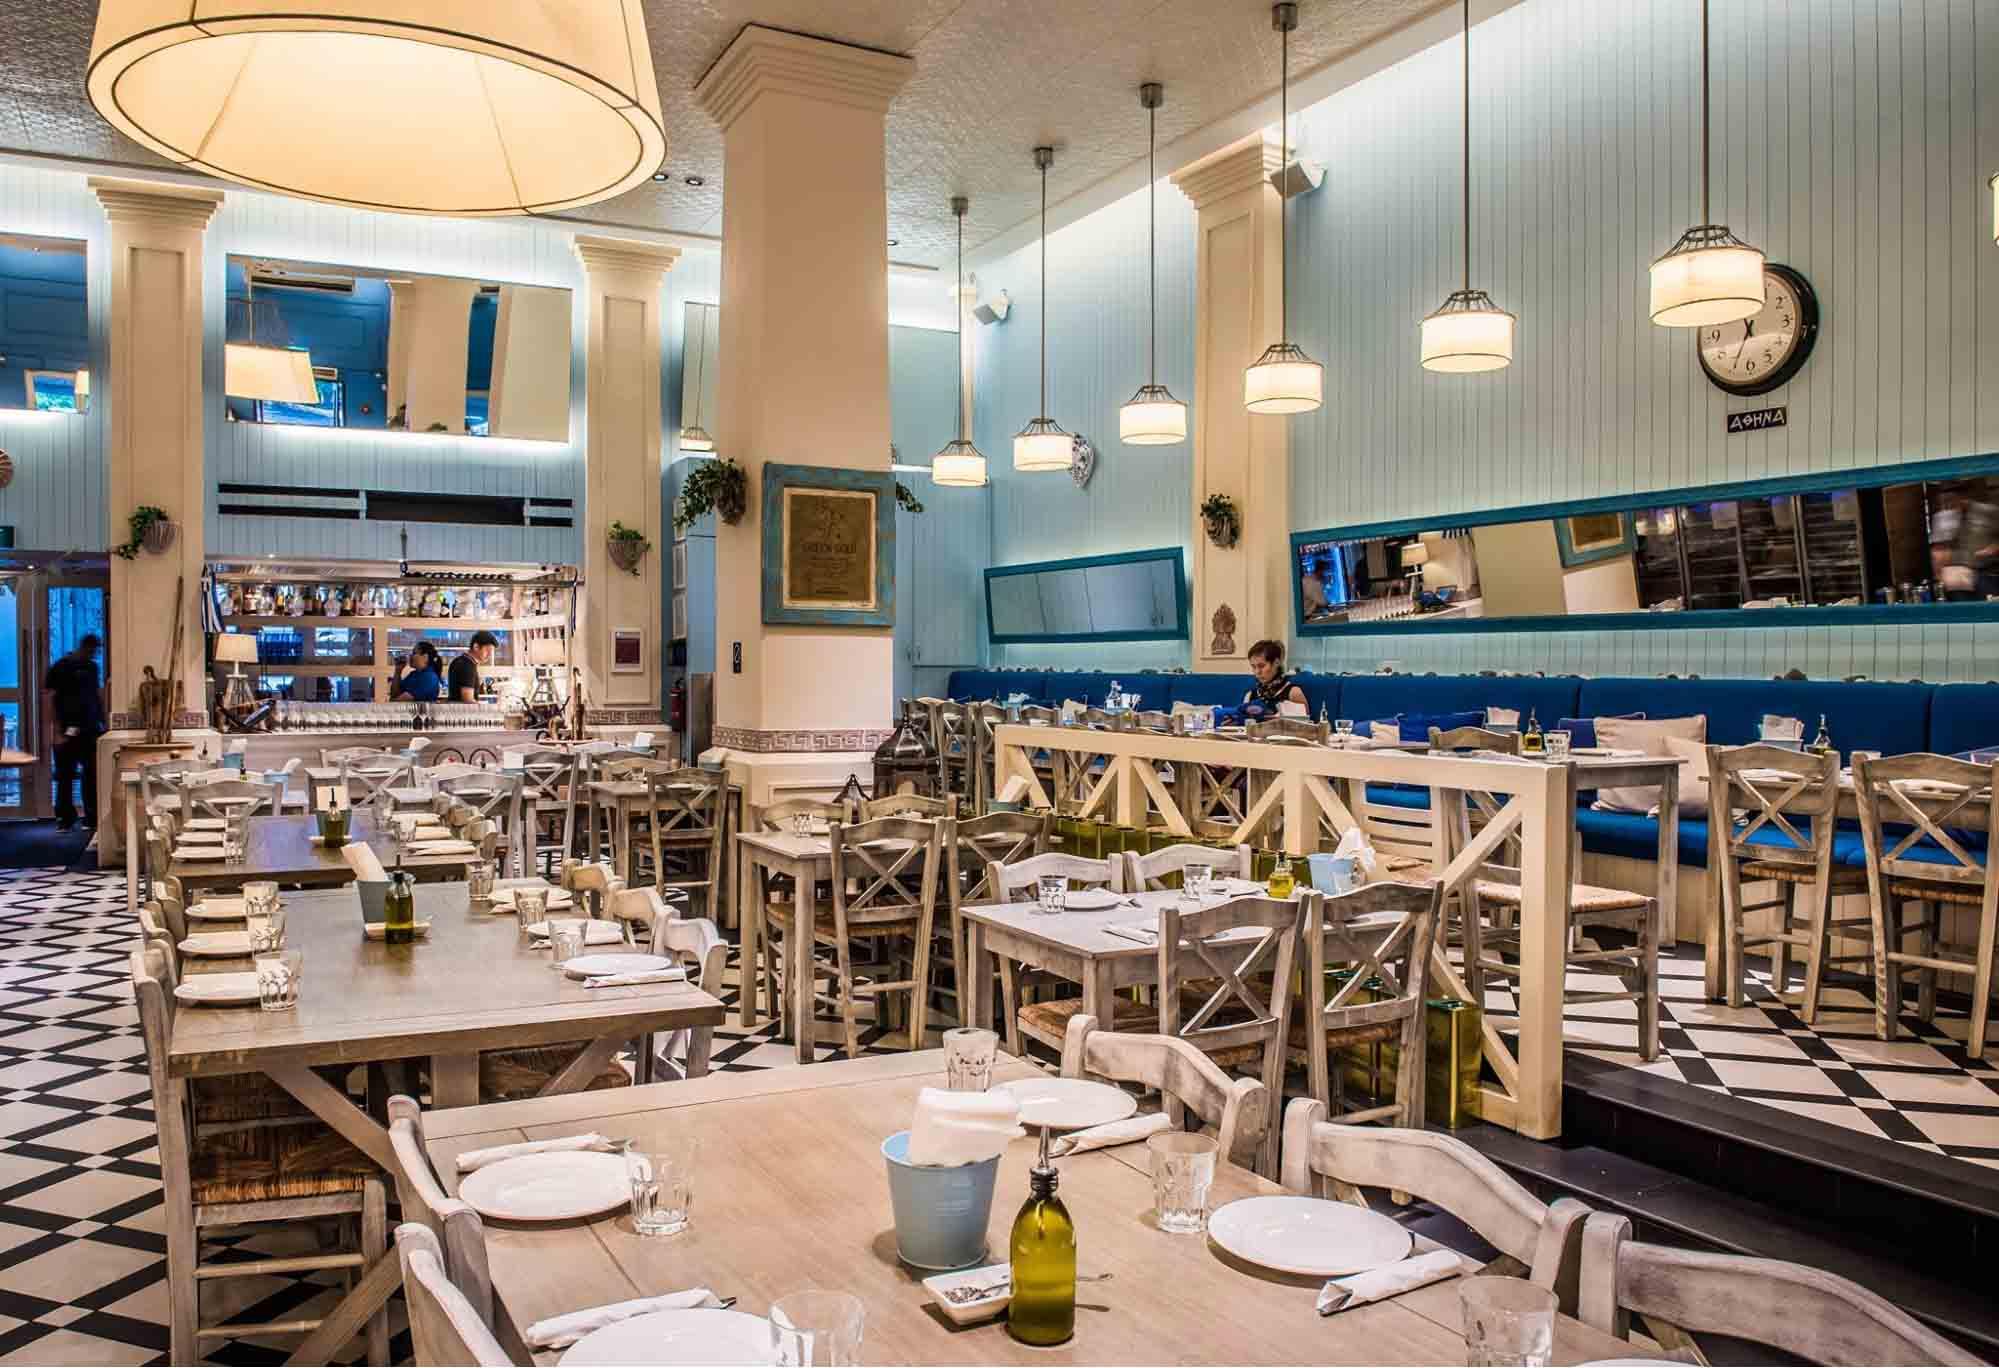 Dempsey Hil Restaurants - Blu Kouzina ambience